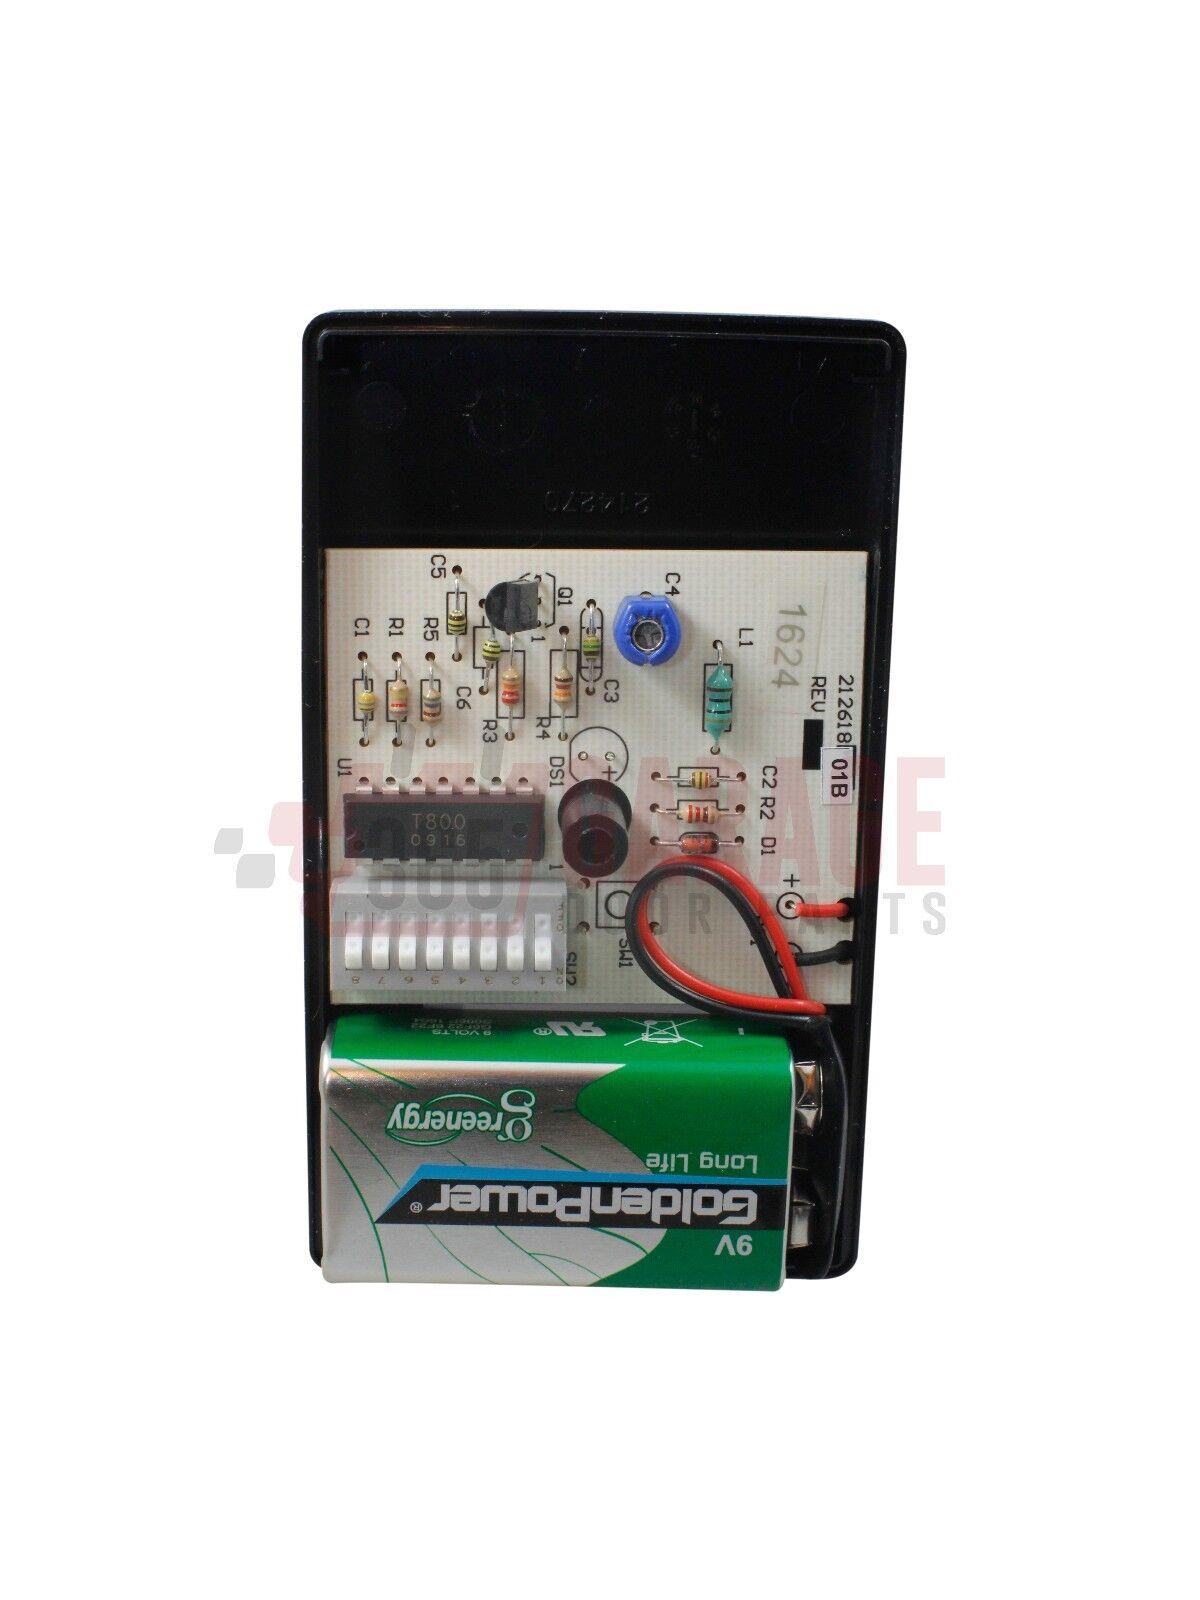 Linear Delta 3 Dt Dta Dtd Dtc Garage Door Remote Dnt00002a Ebay